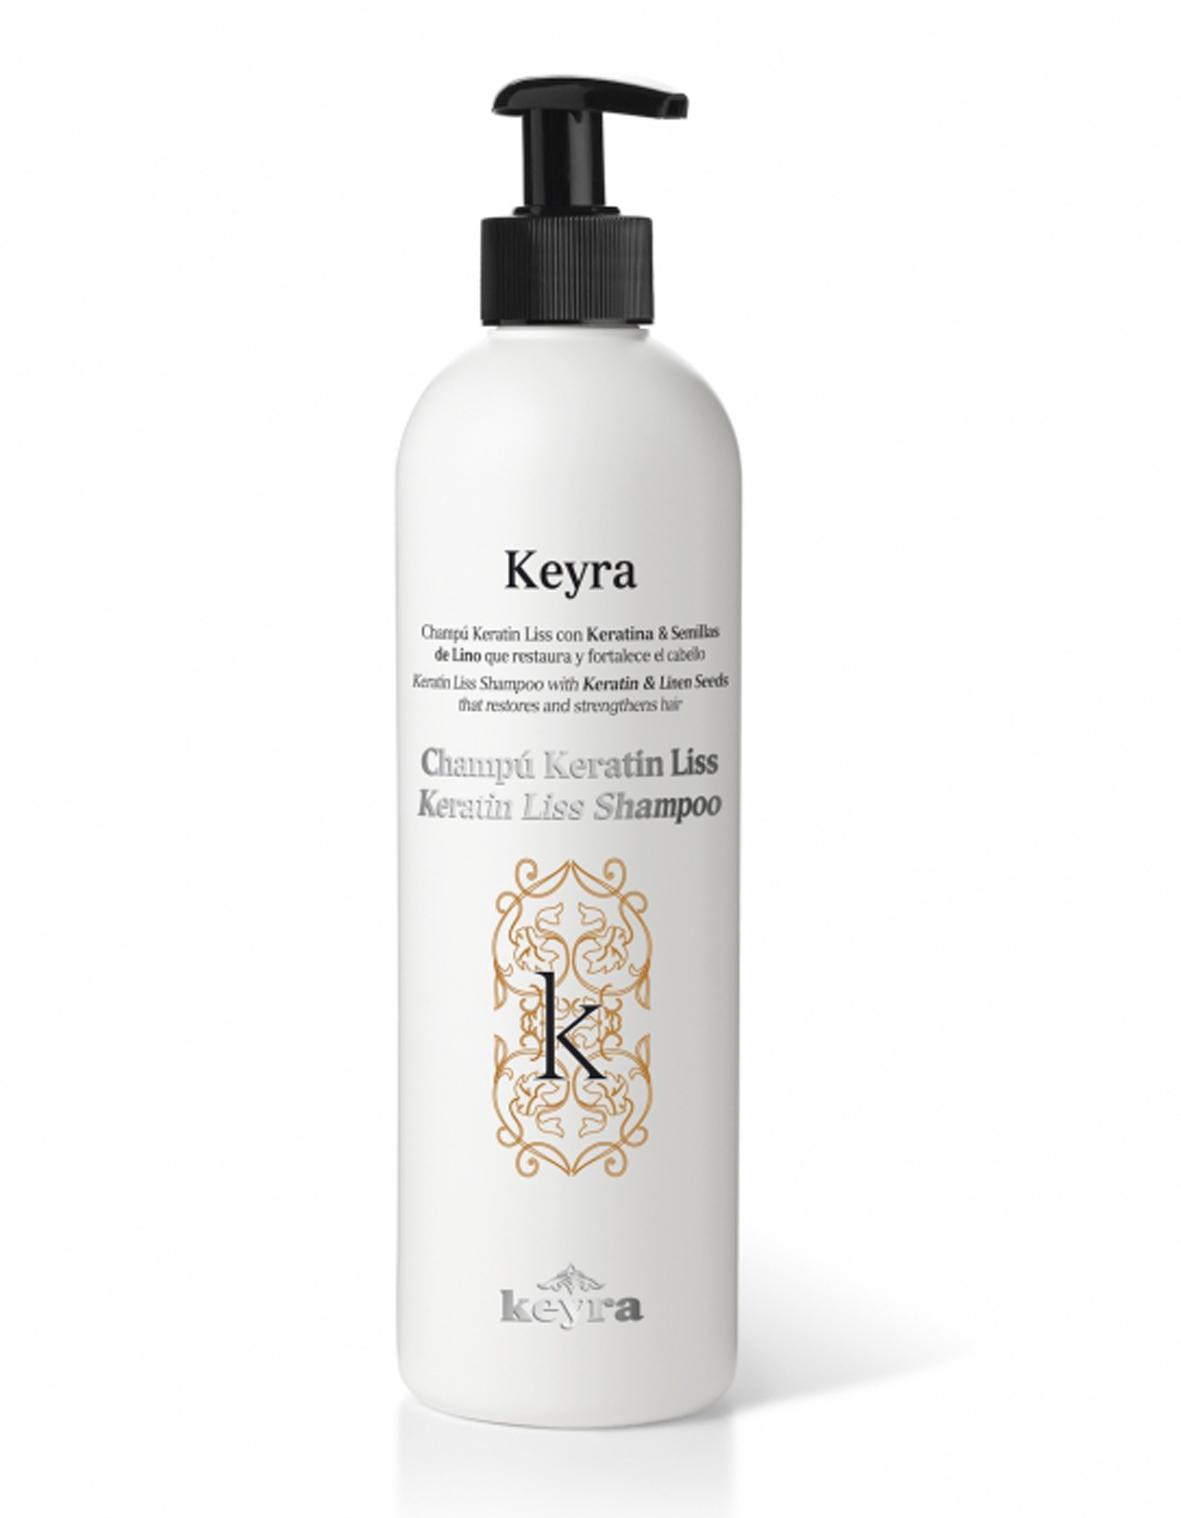 Keyra Keratin Liss Shampoo - regenerační šampon, 500 ml